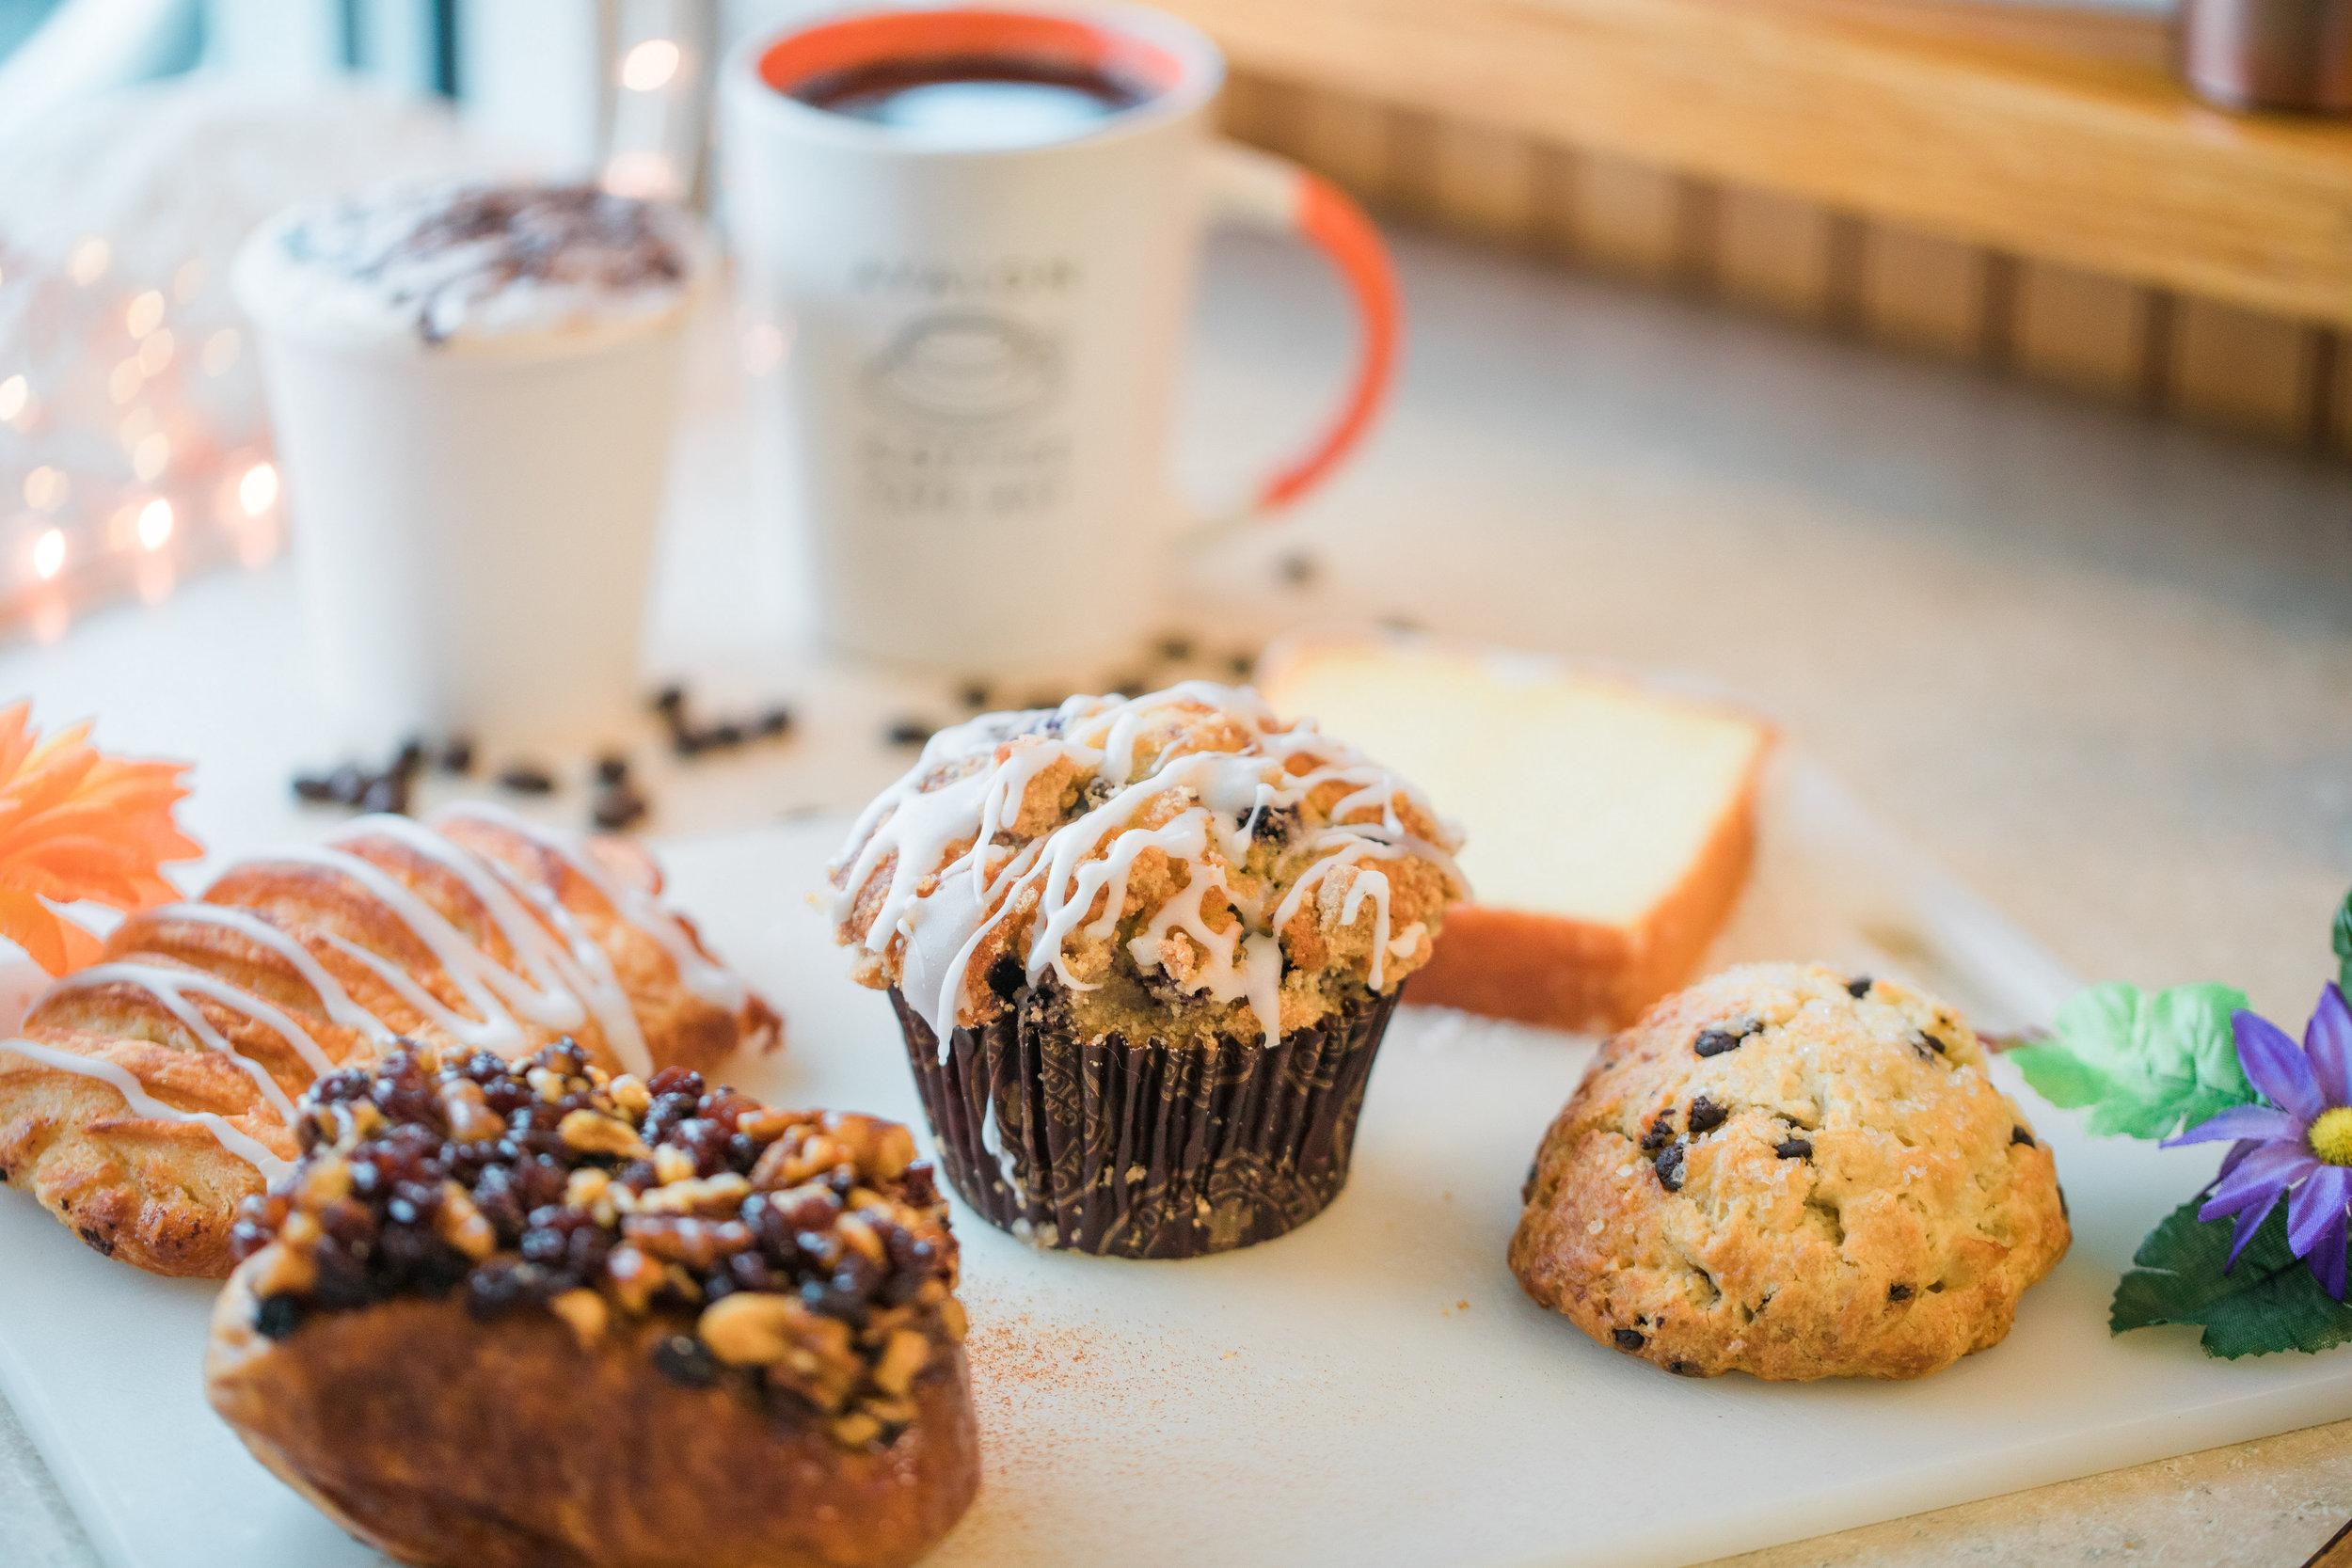 Pastires, coffee, latte5.jpg